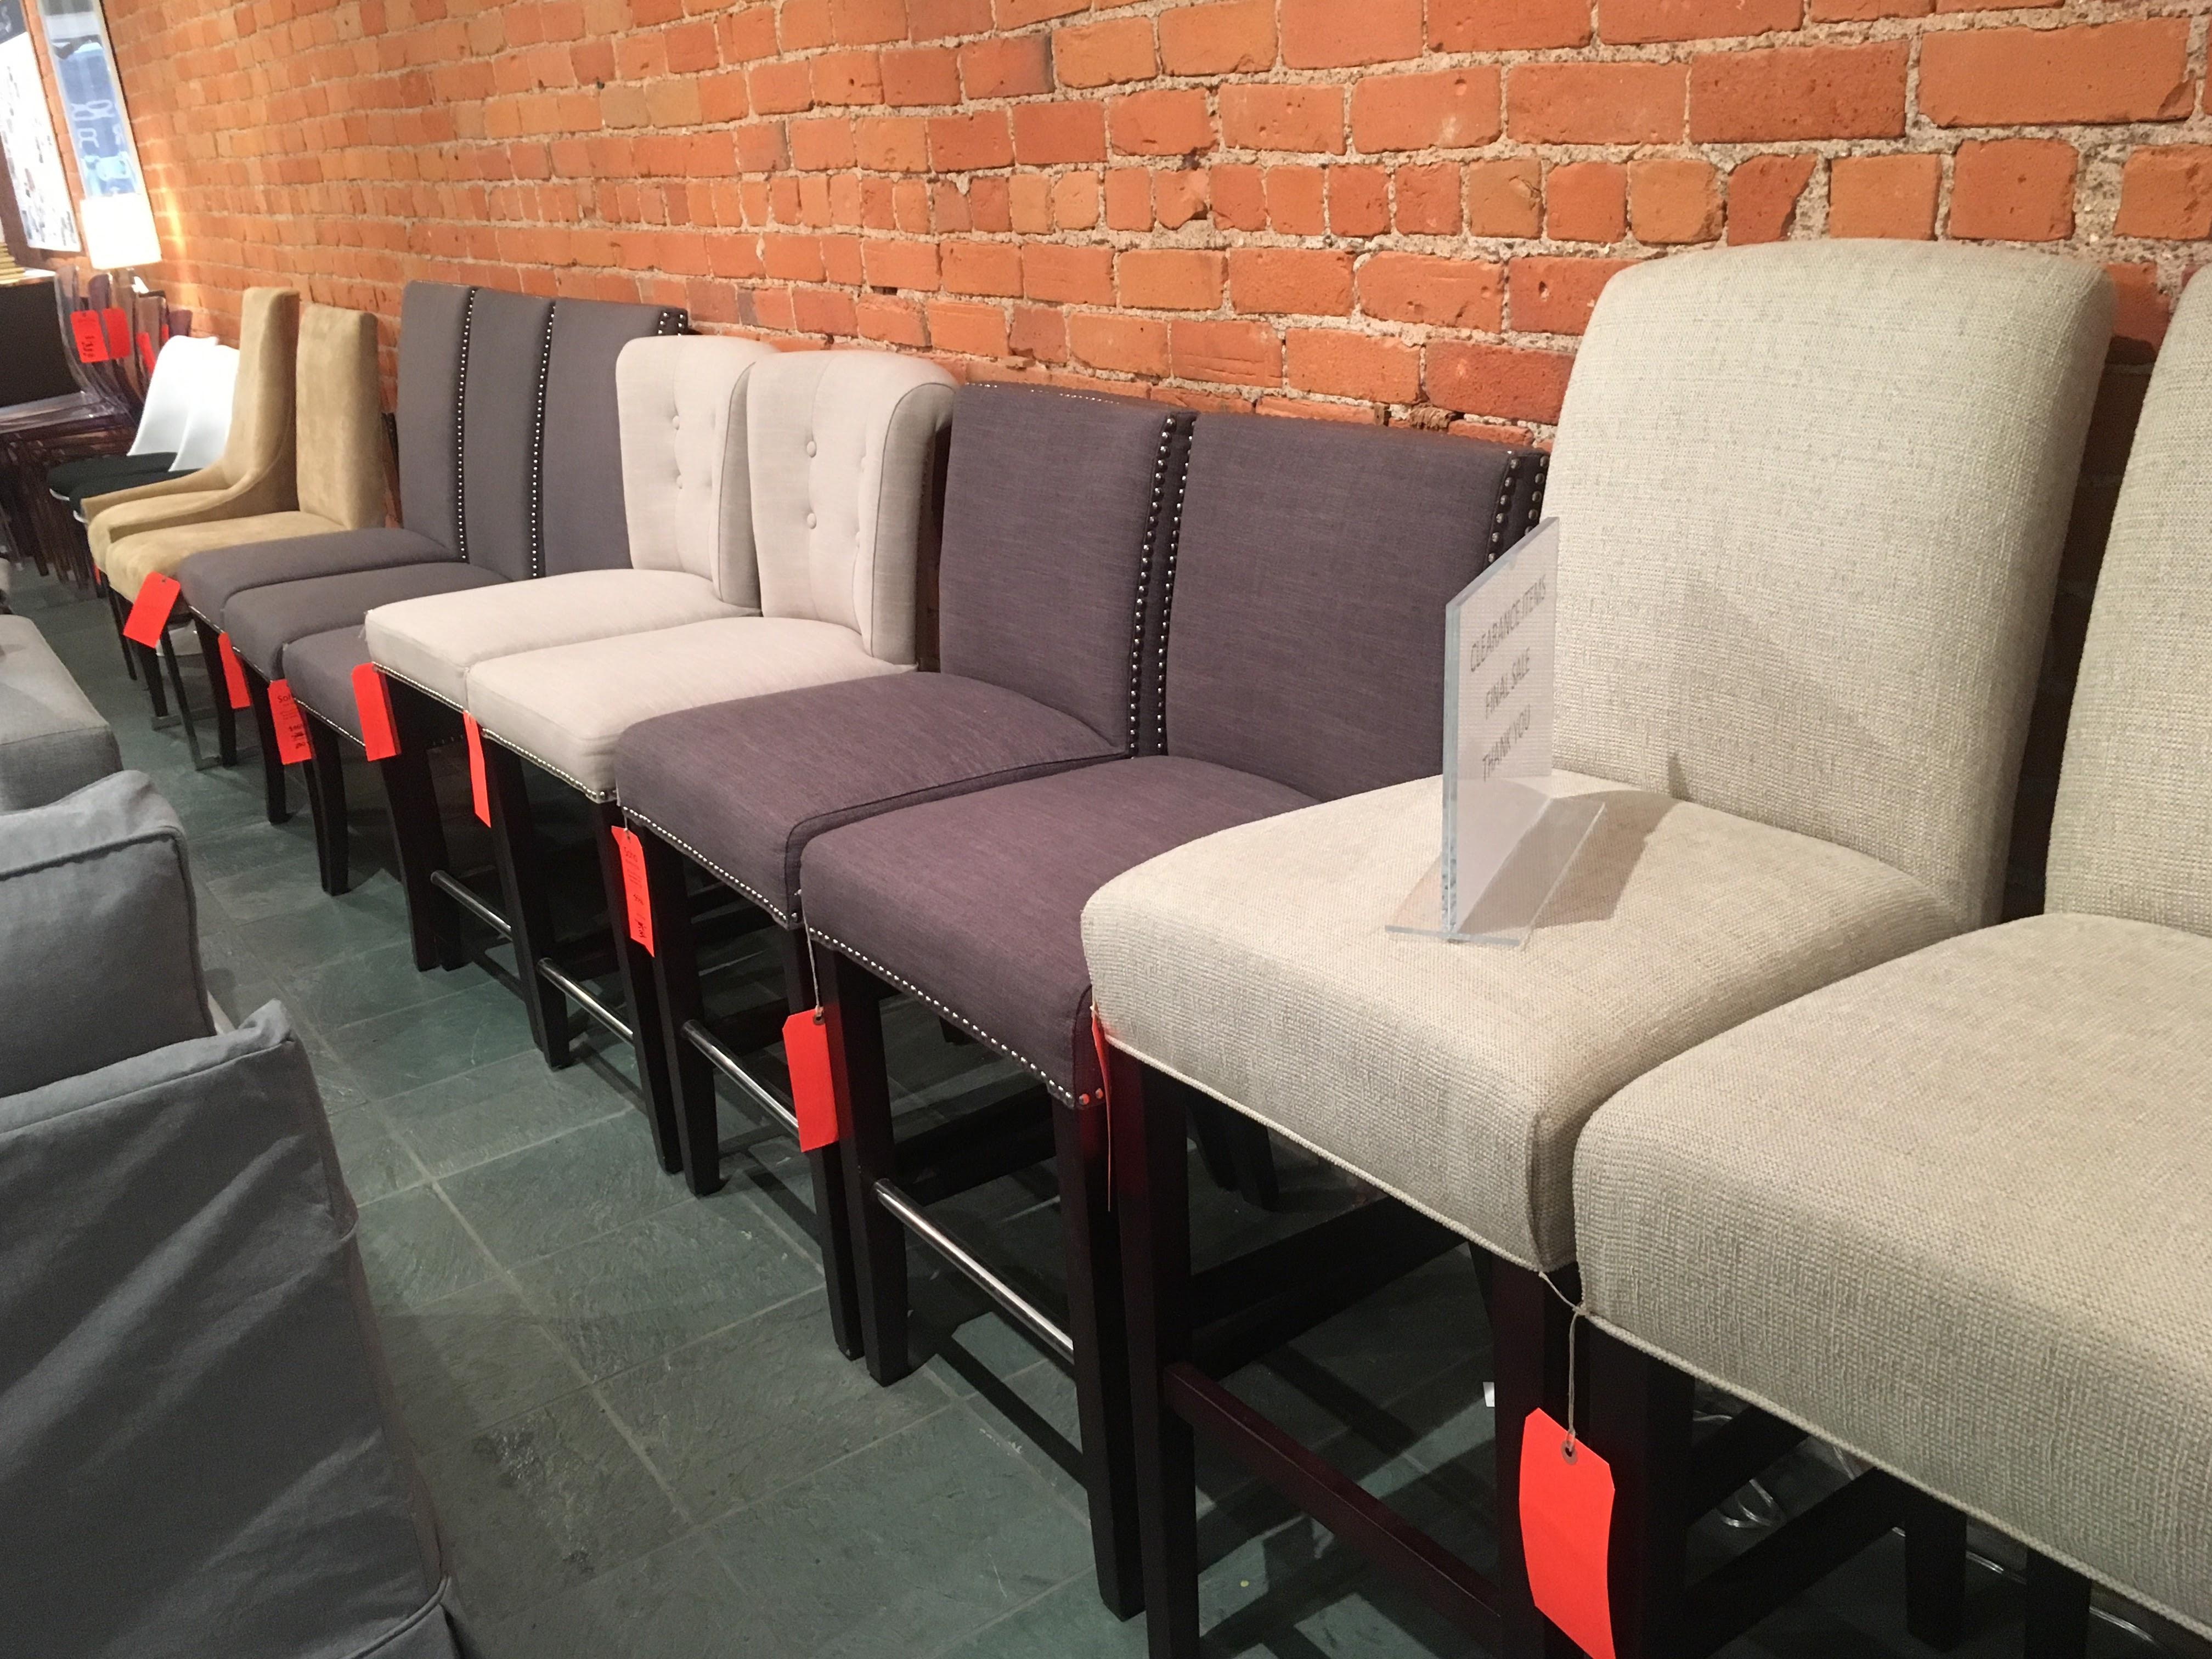 Summer Clearance Sale Furniture Ann Arbor Accent Chairs Three Chairs